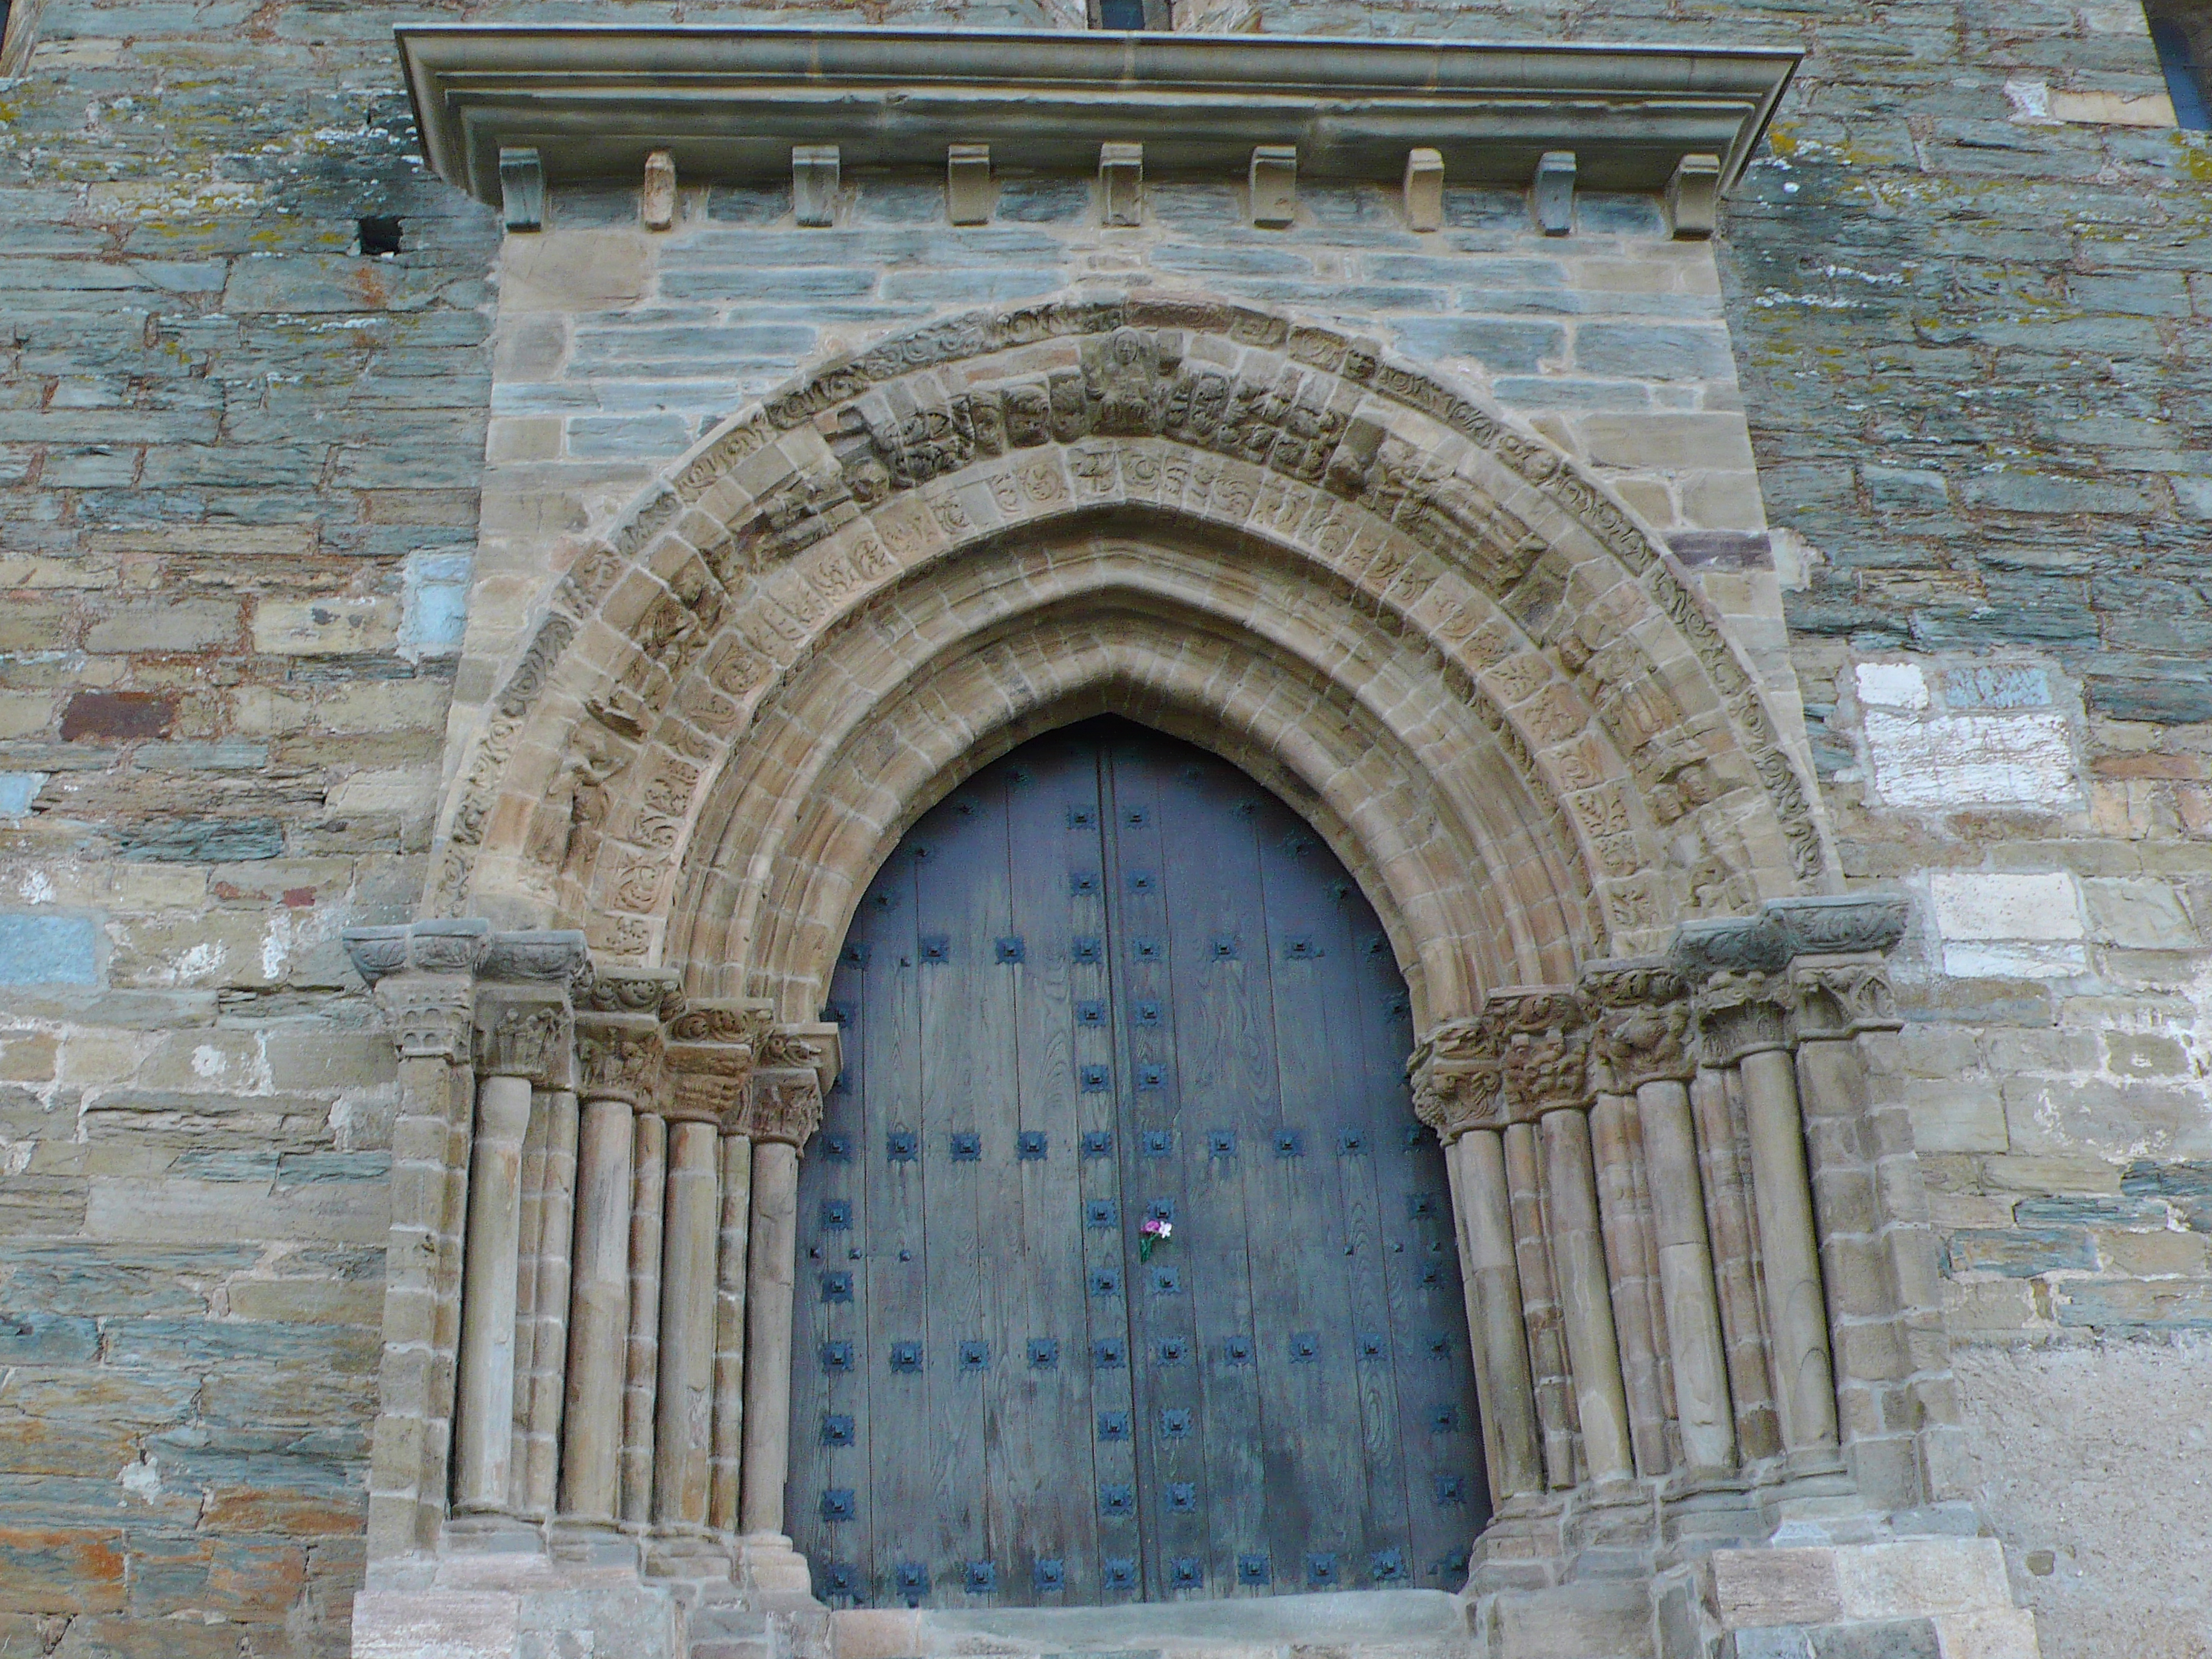 Risultati immagini per puerta del perdon villafranca del bierzo